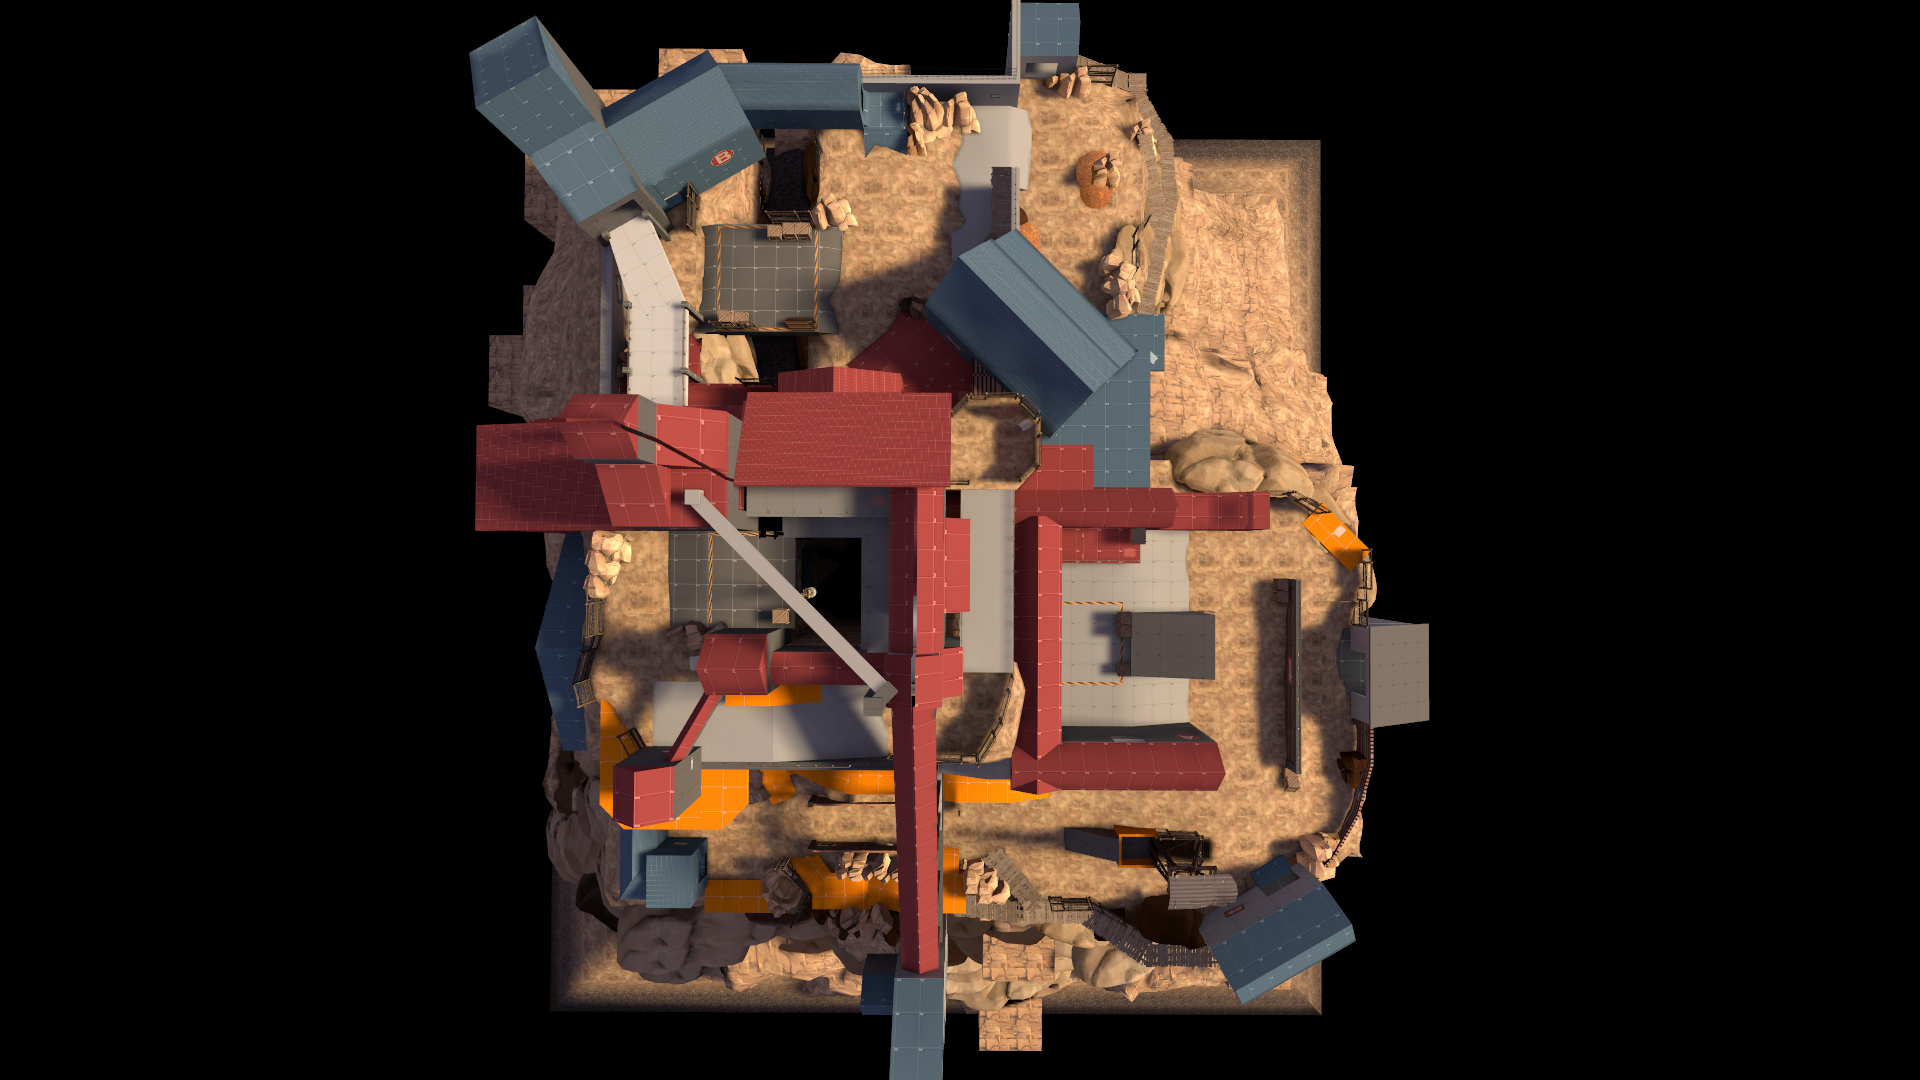 Team Fortress 2 Screenshot 2020.01.17 - 21.40.01.61.png